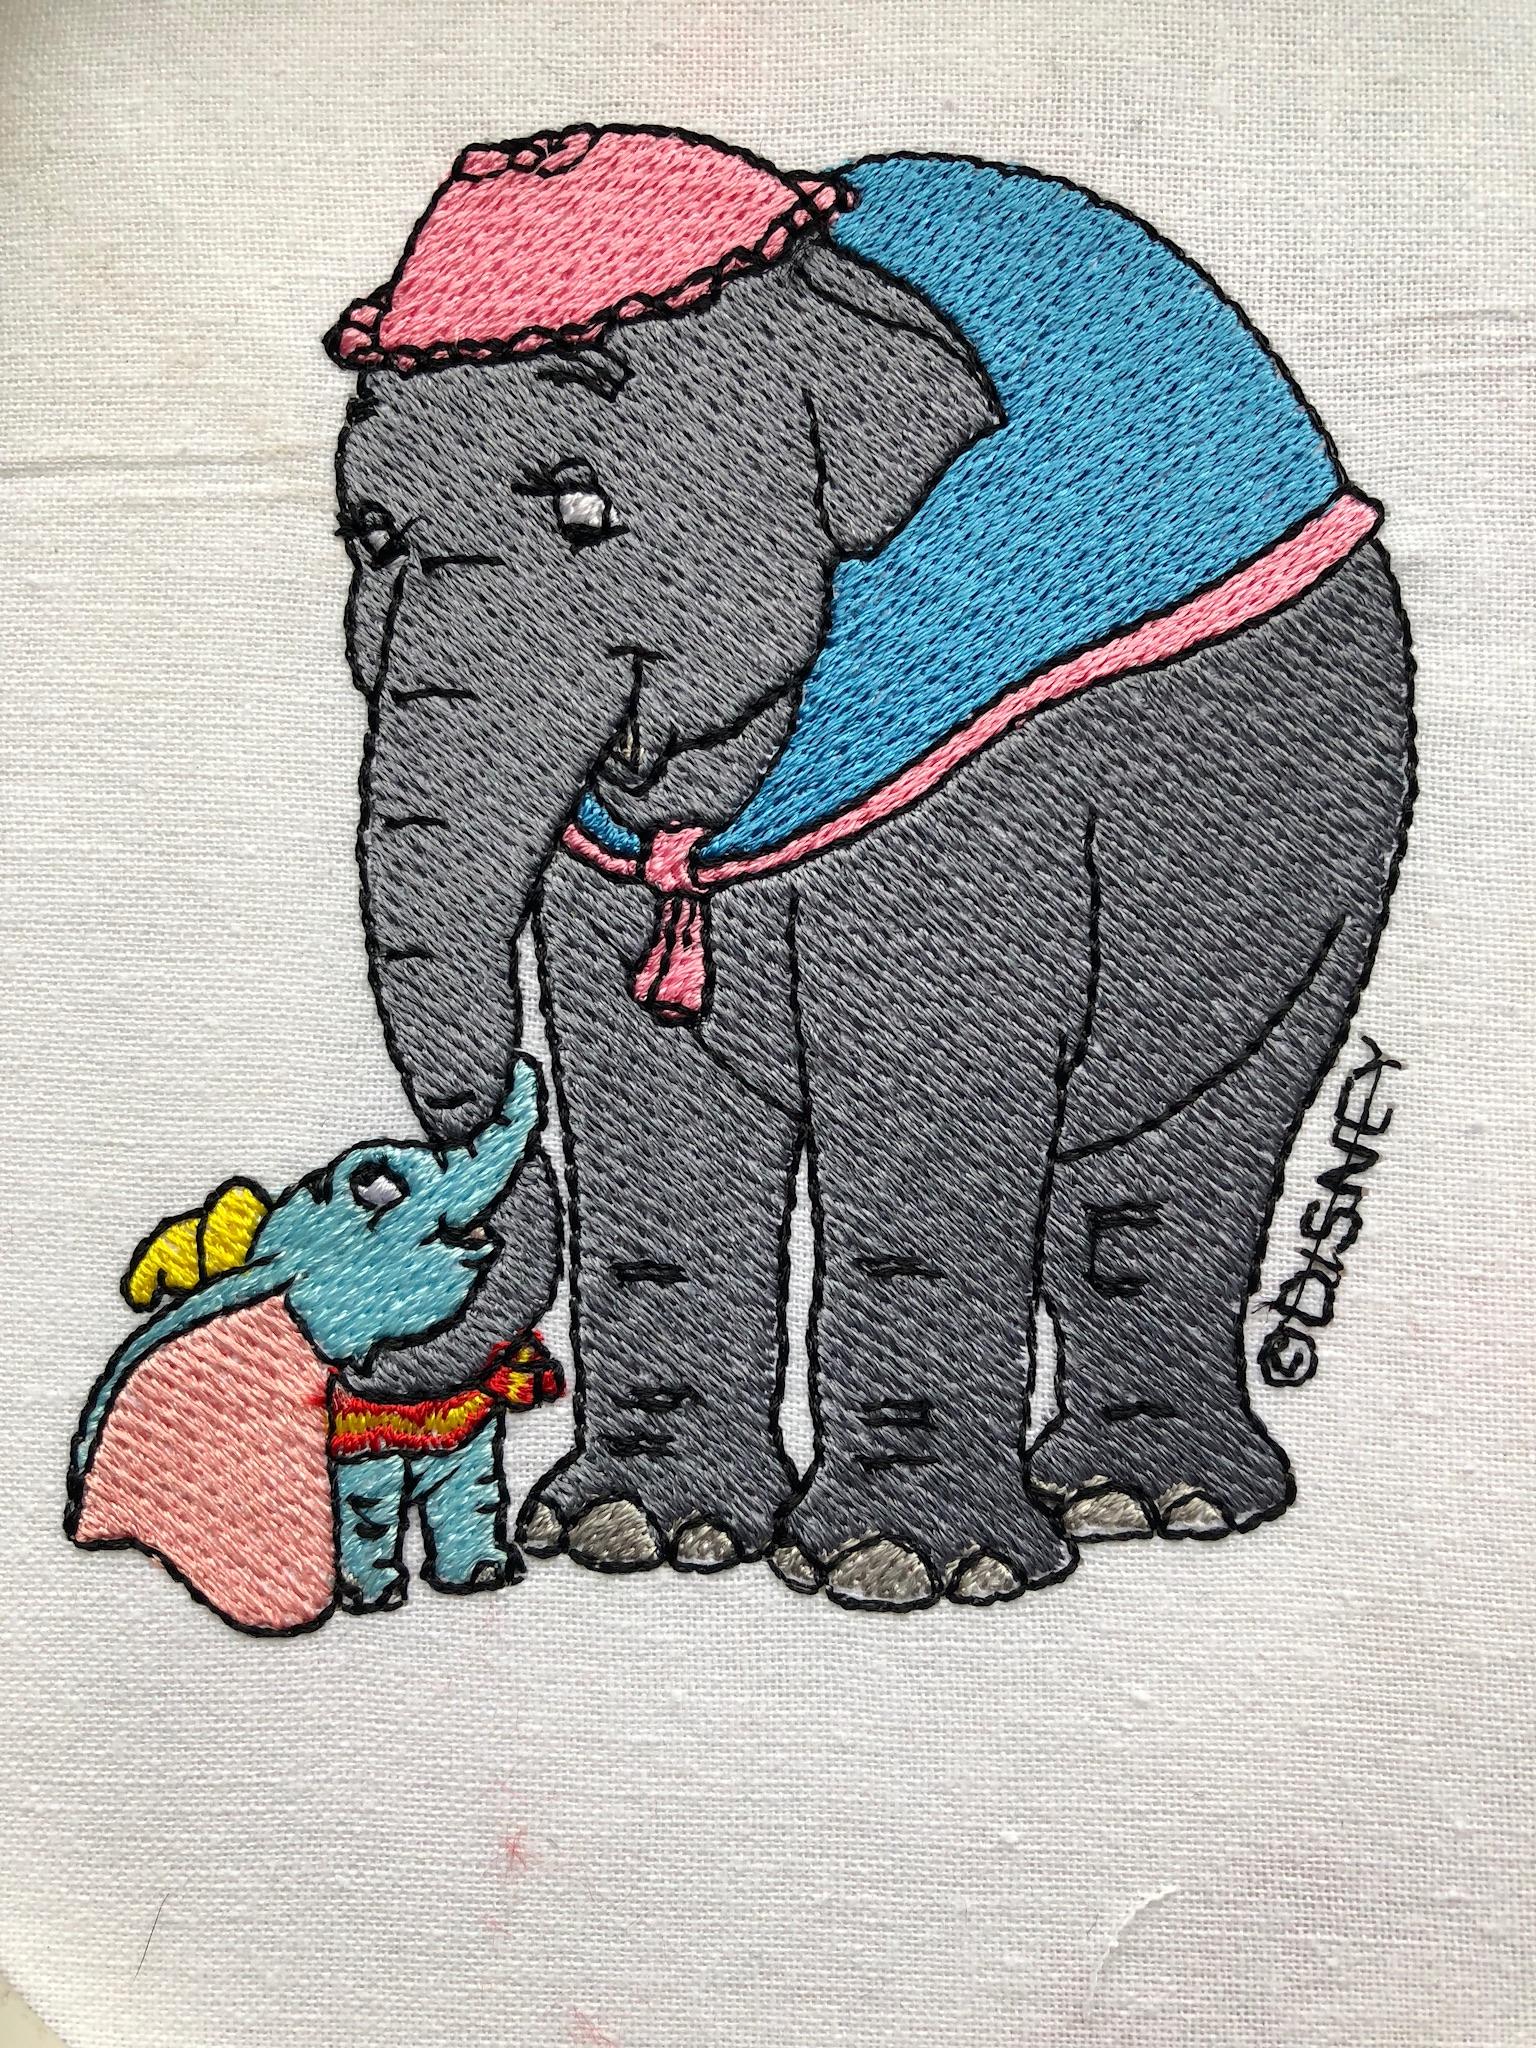 Embroidery/IMG_2162.JPG